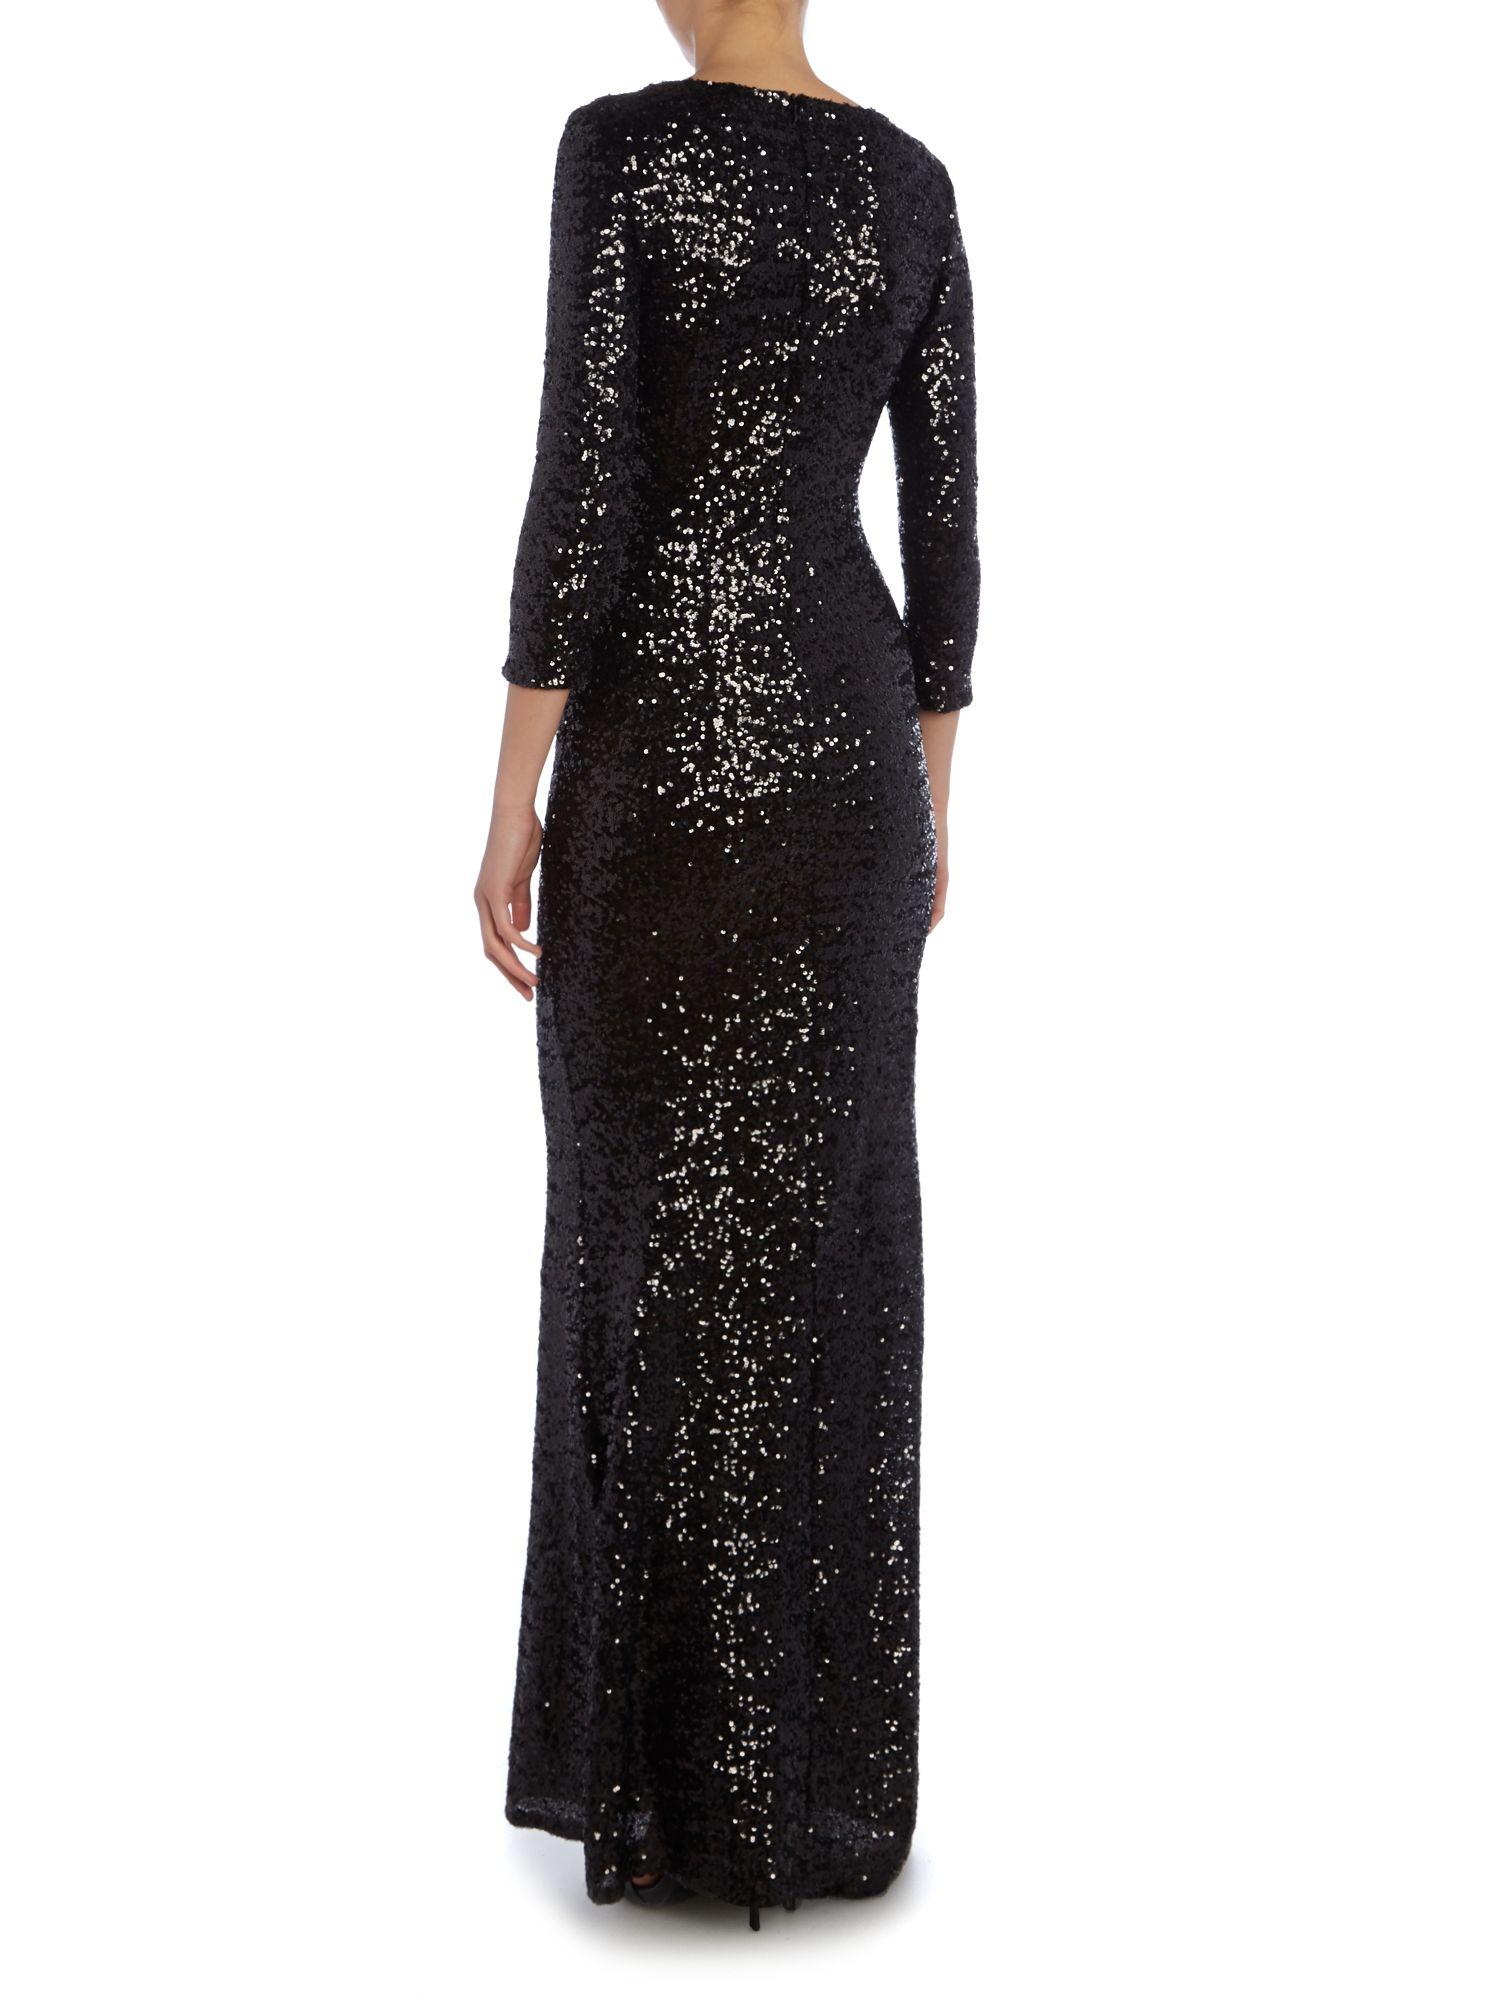 Black dress house of fraser -  Long Sleeve Maxi Dress House Of Fraser